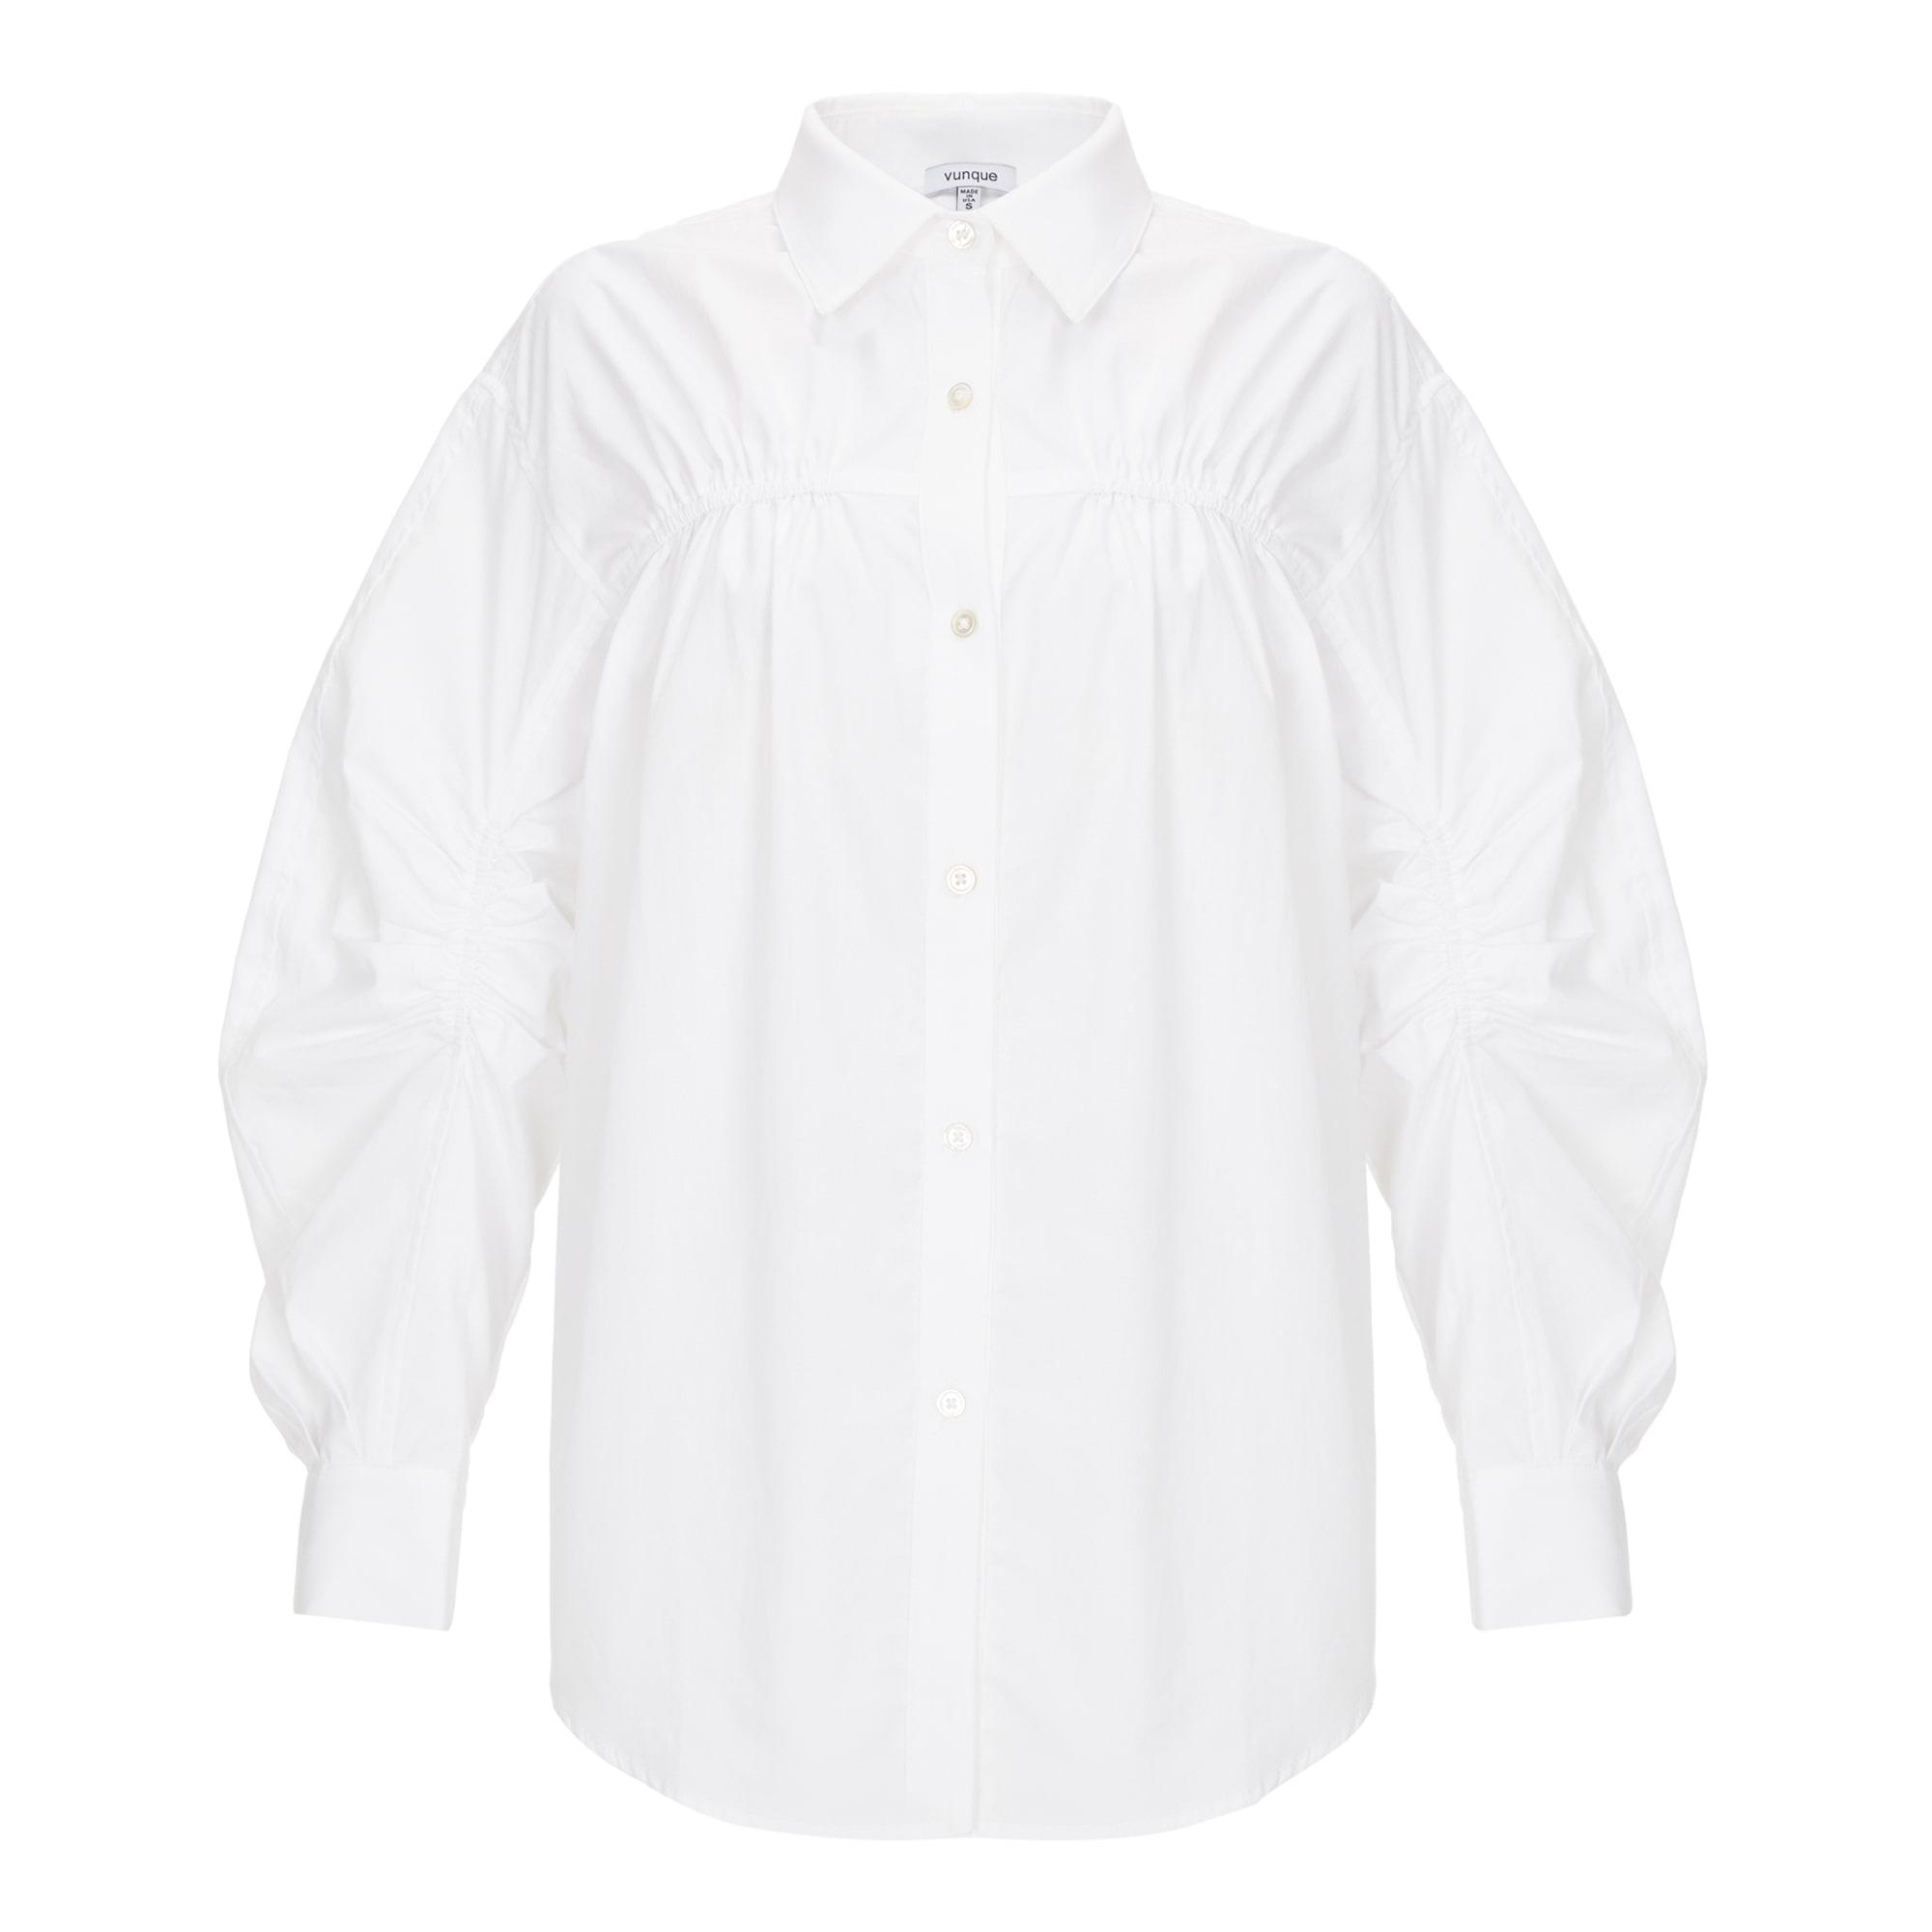 Bud Pleats Shirt (버드 플리츠 셔츠) White